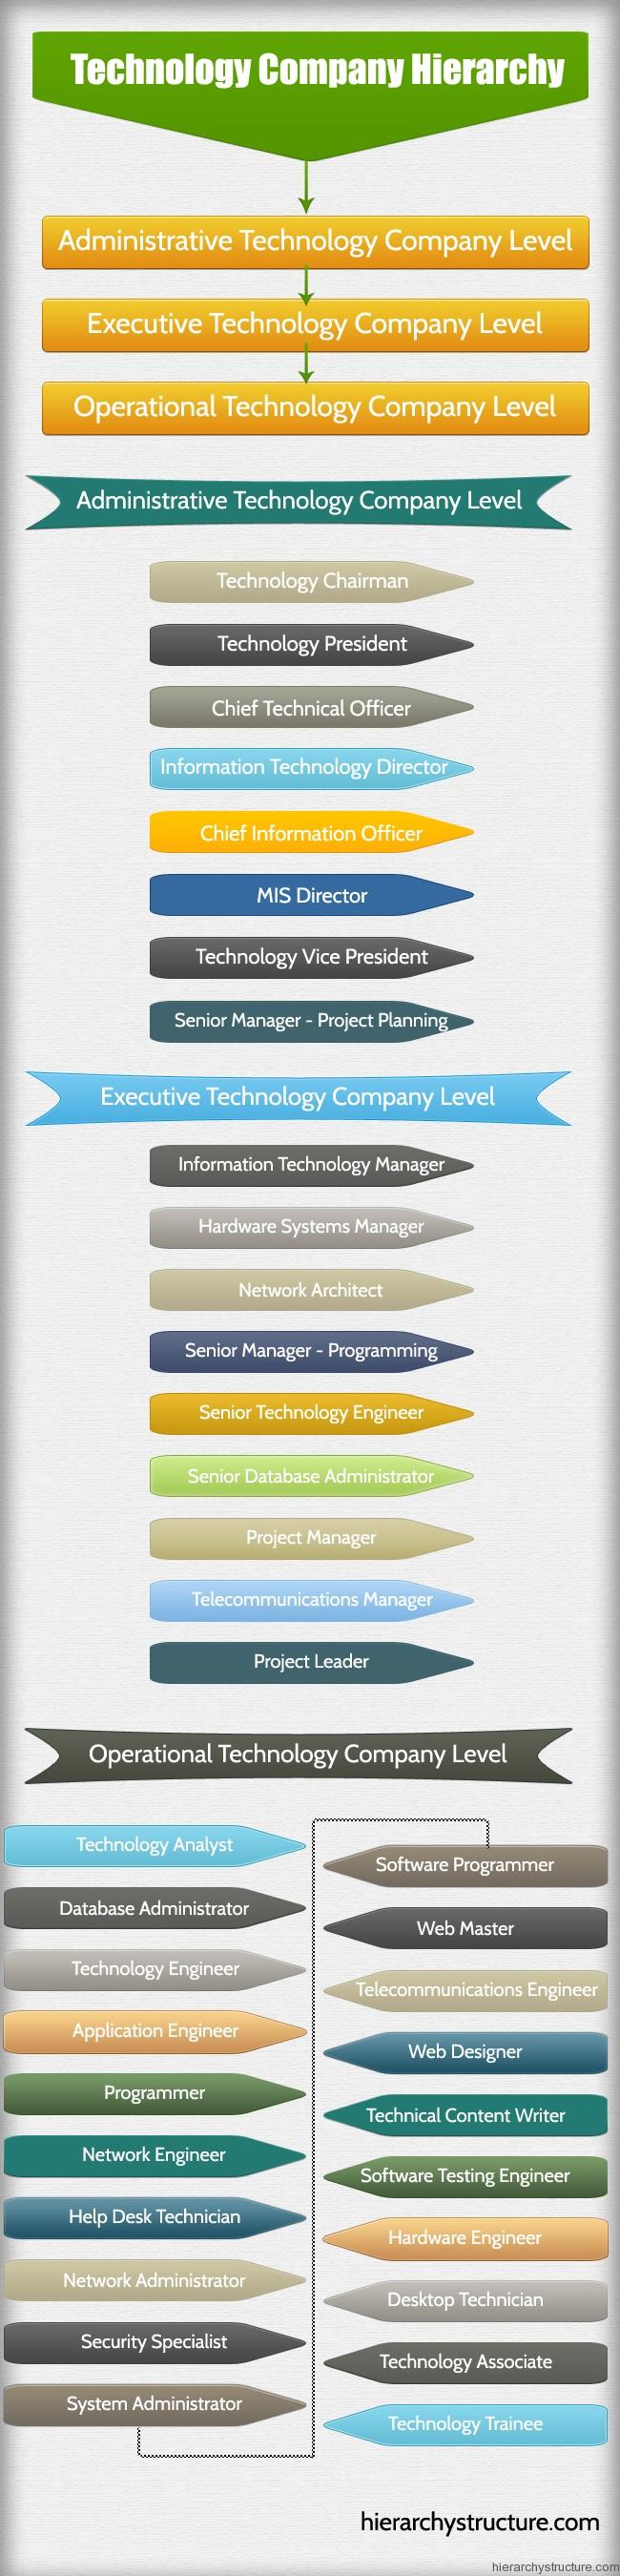 Technology Company Hierarchy